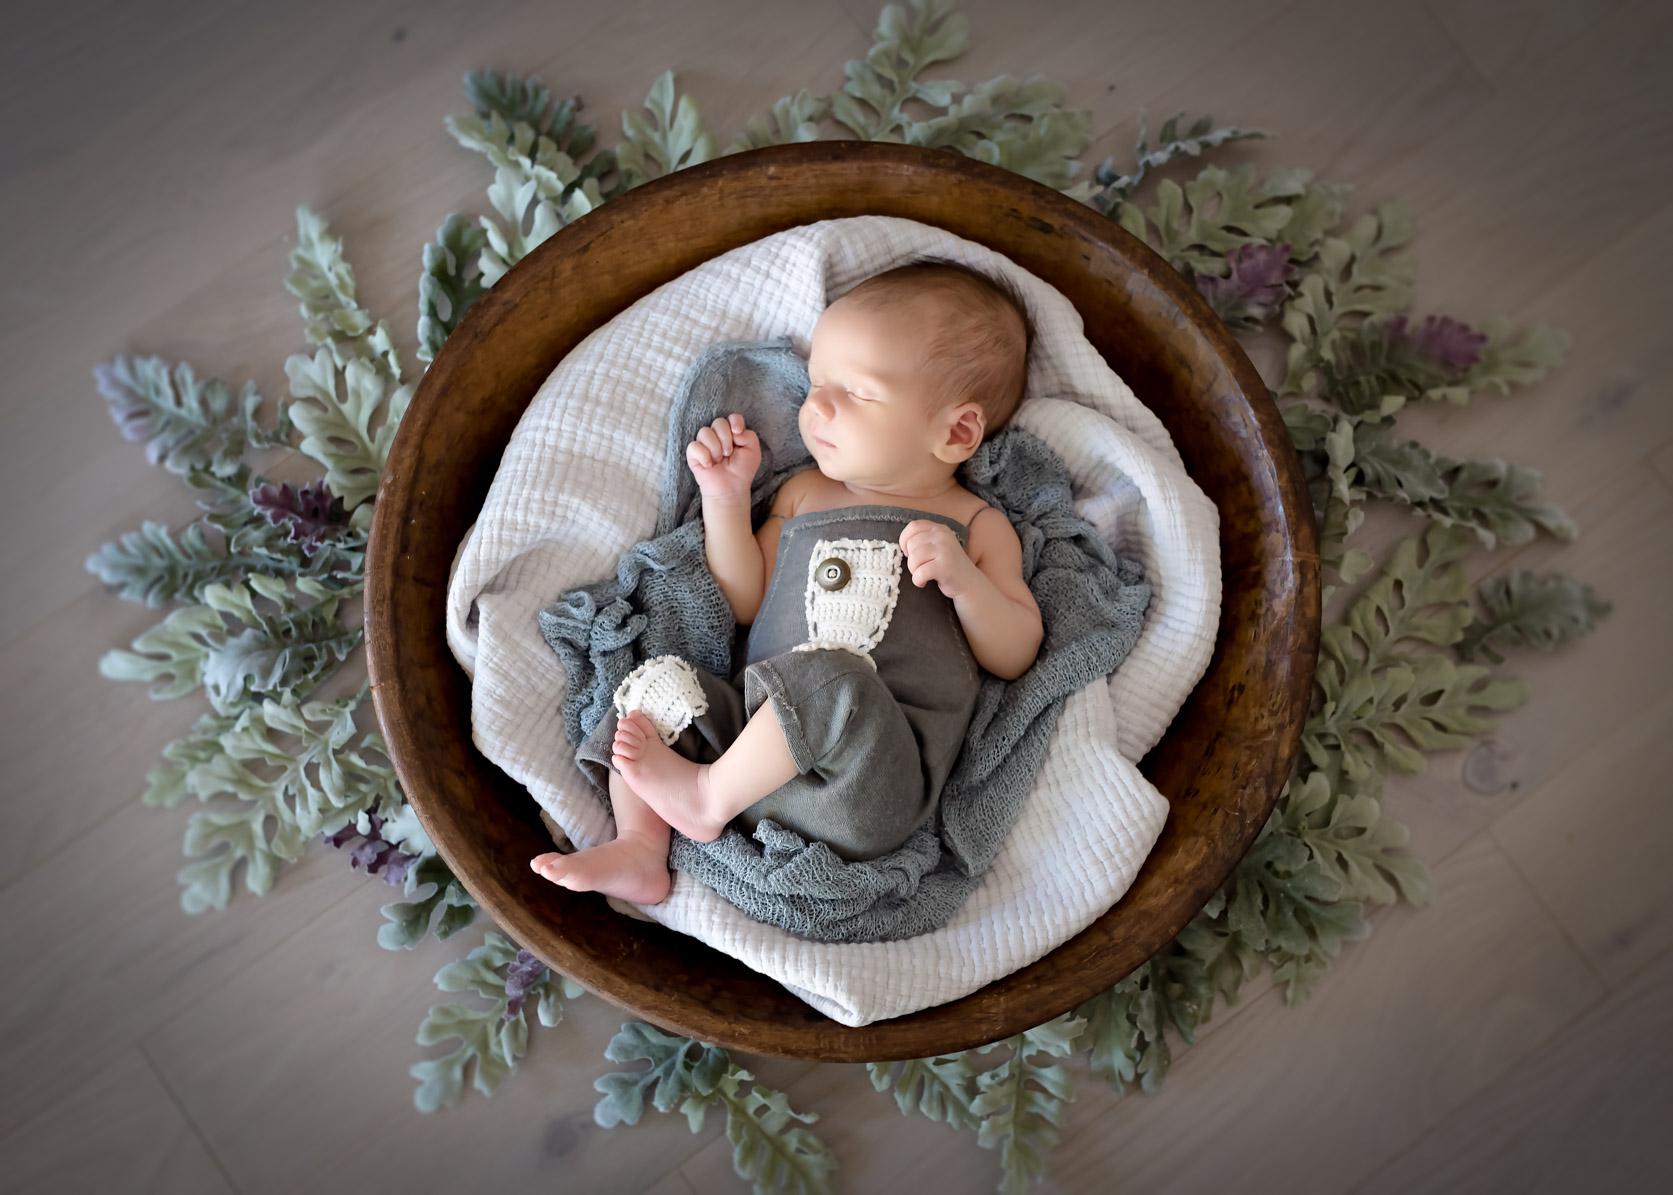 Baby TomislavDSC_6149-Edit.jpg